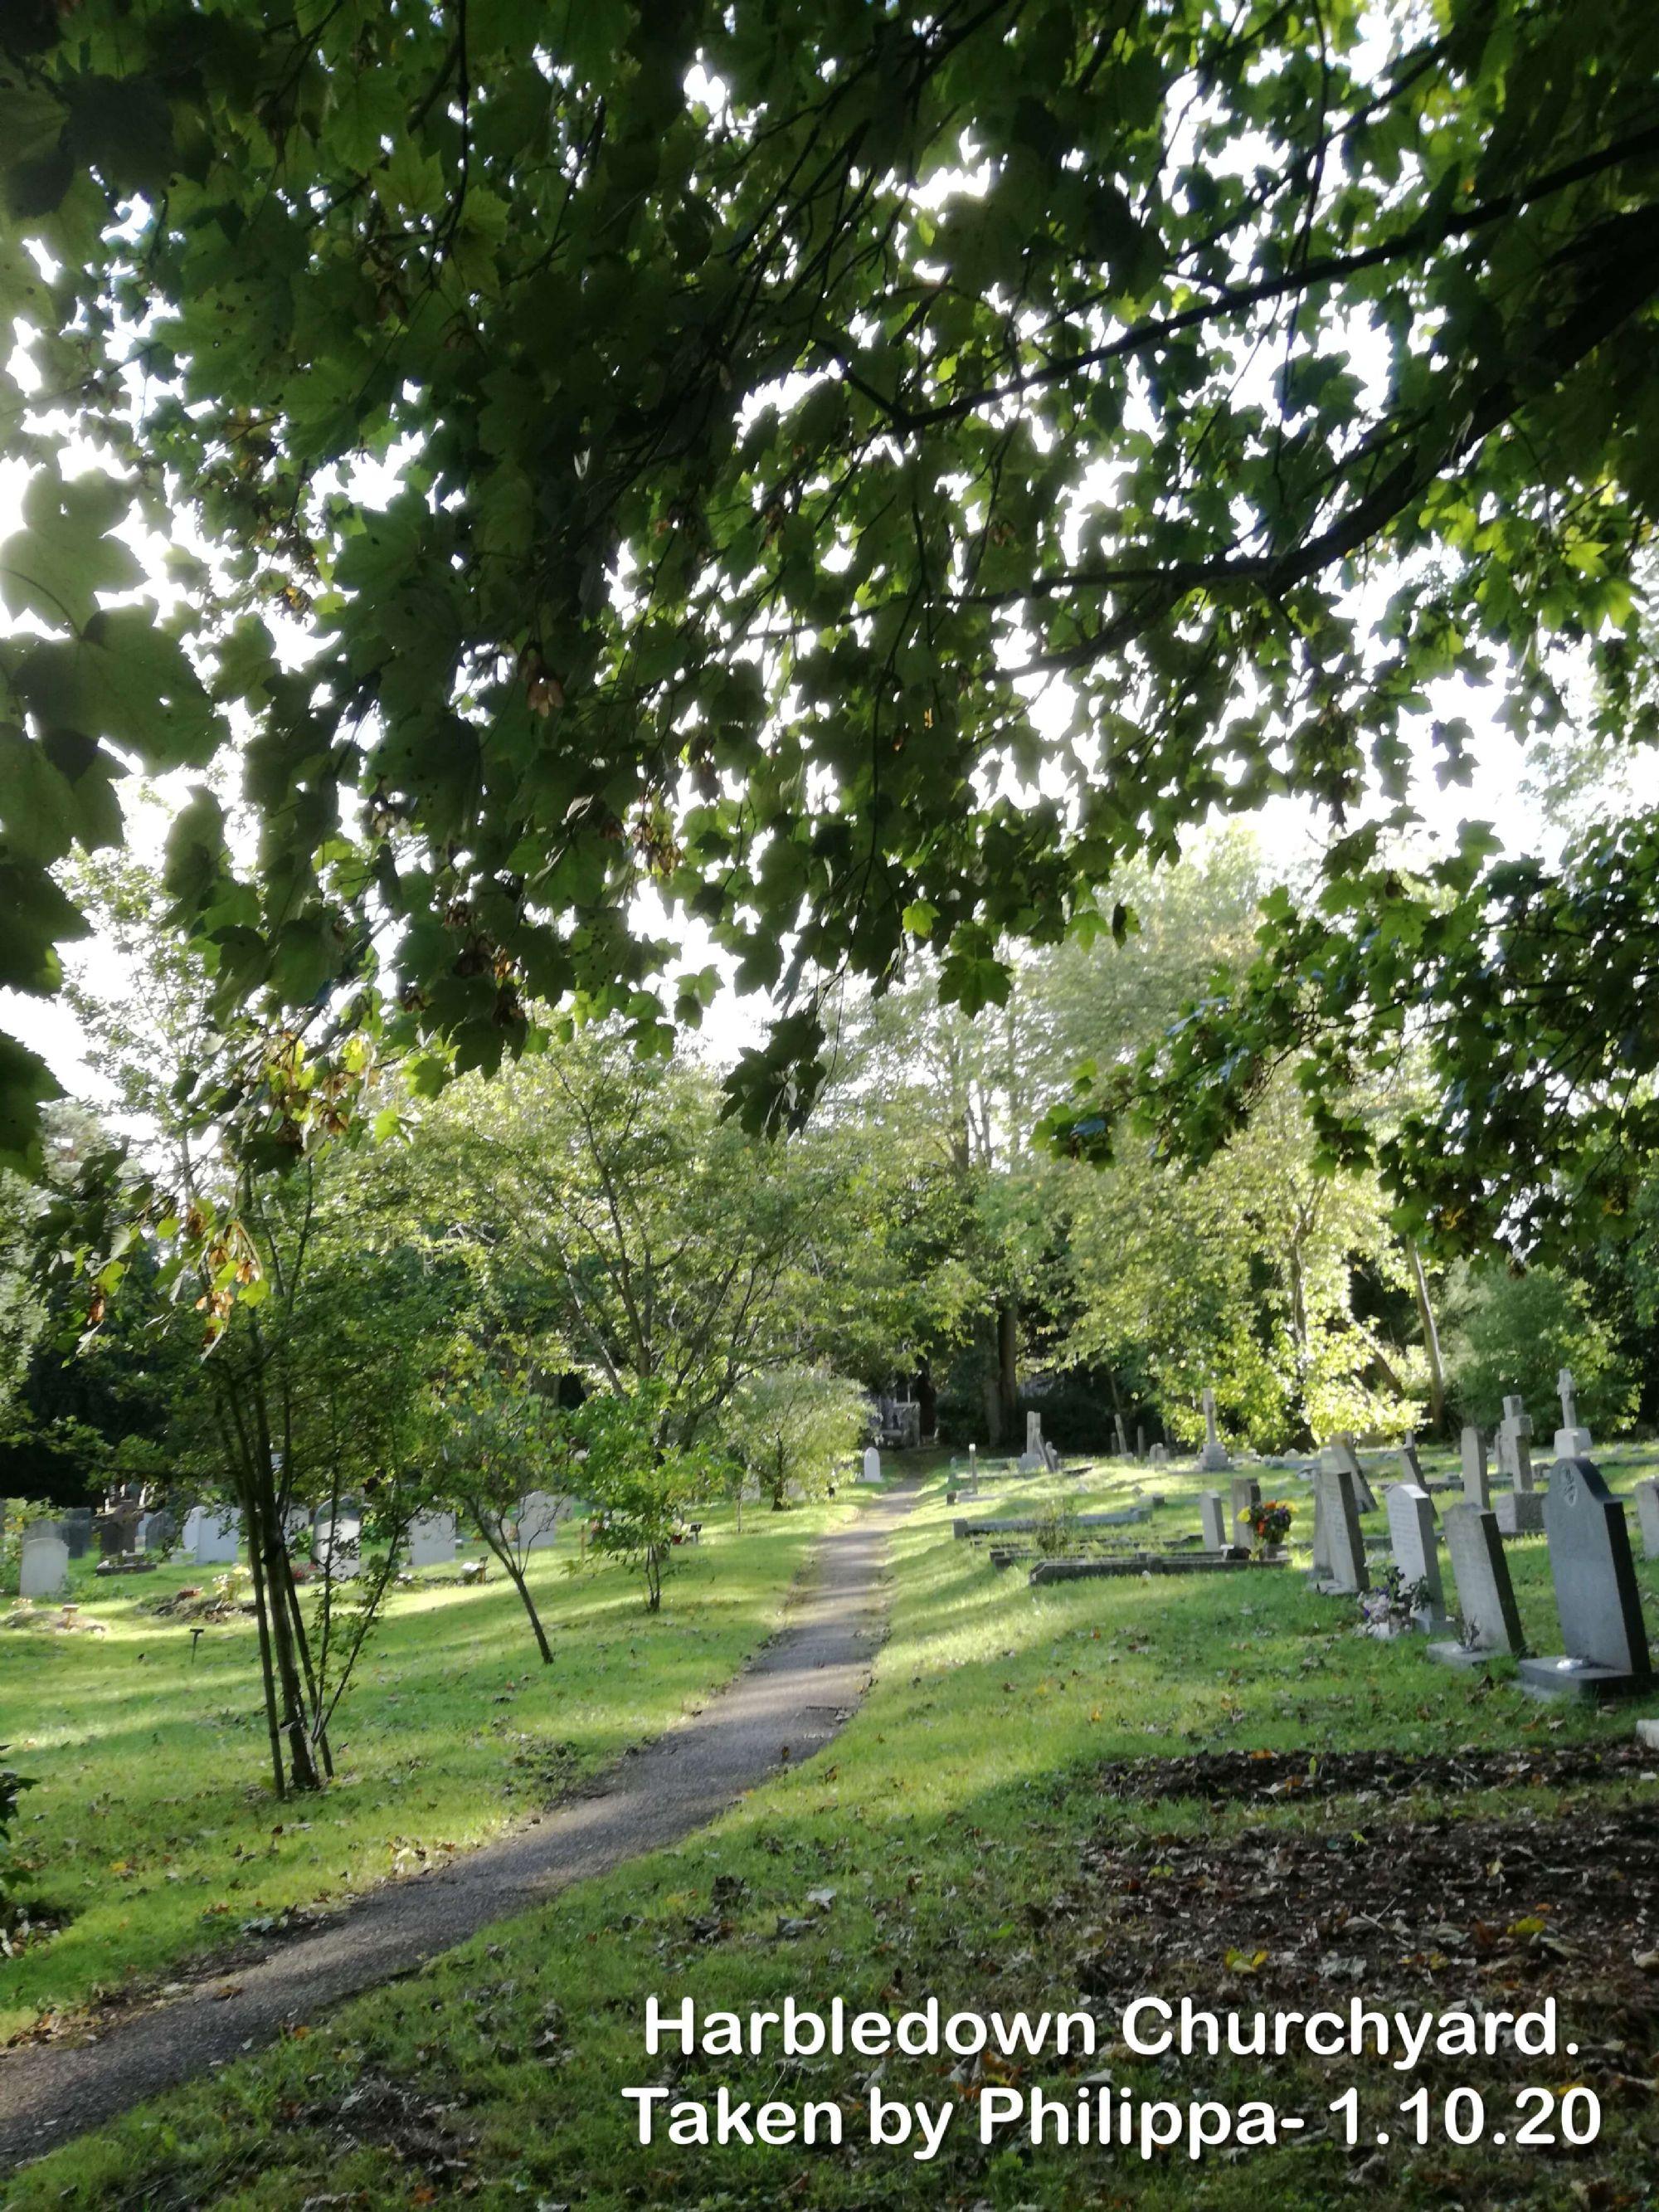 Harbledown Churchyard